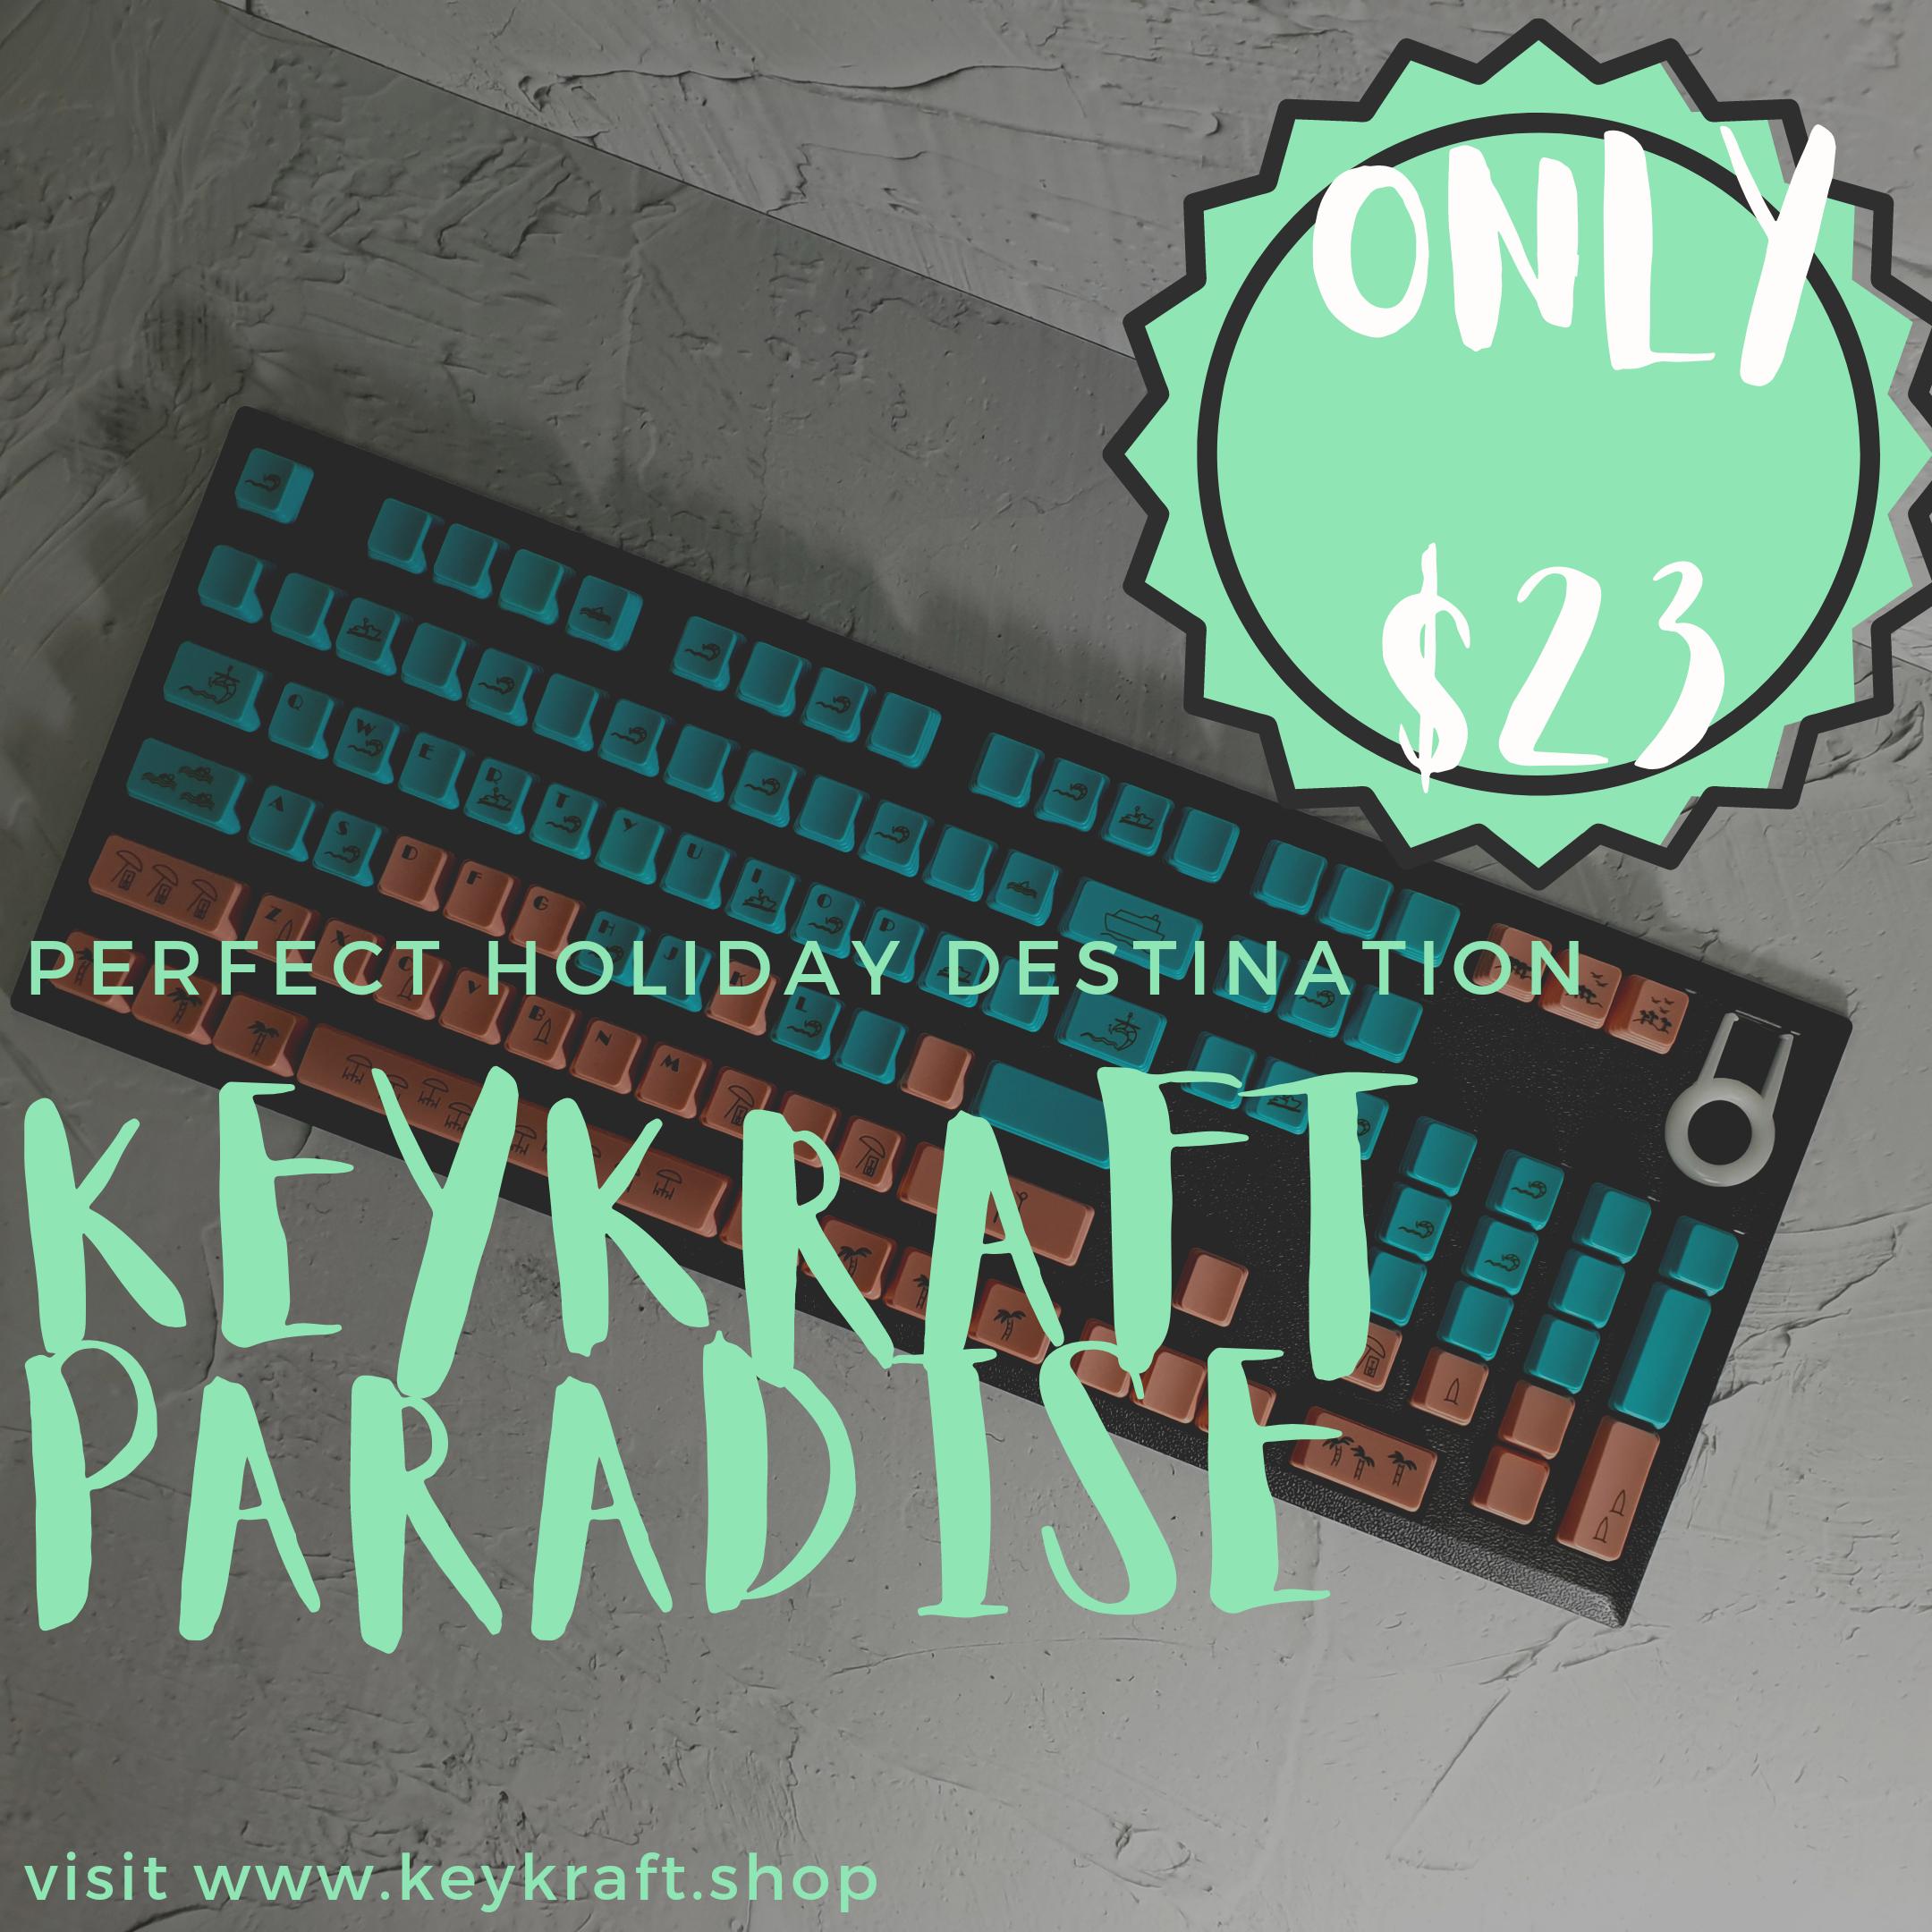 KeyKraft Paradise